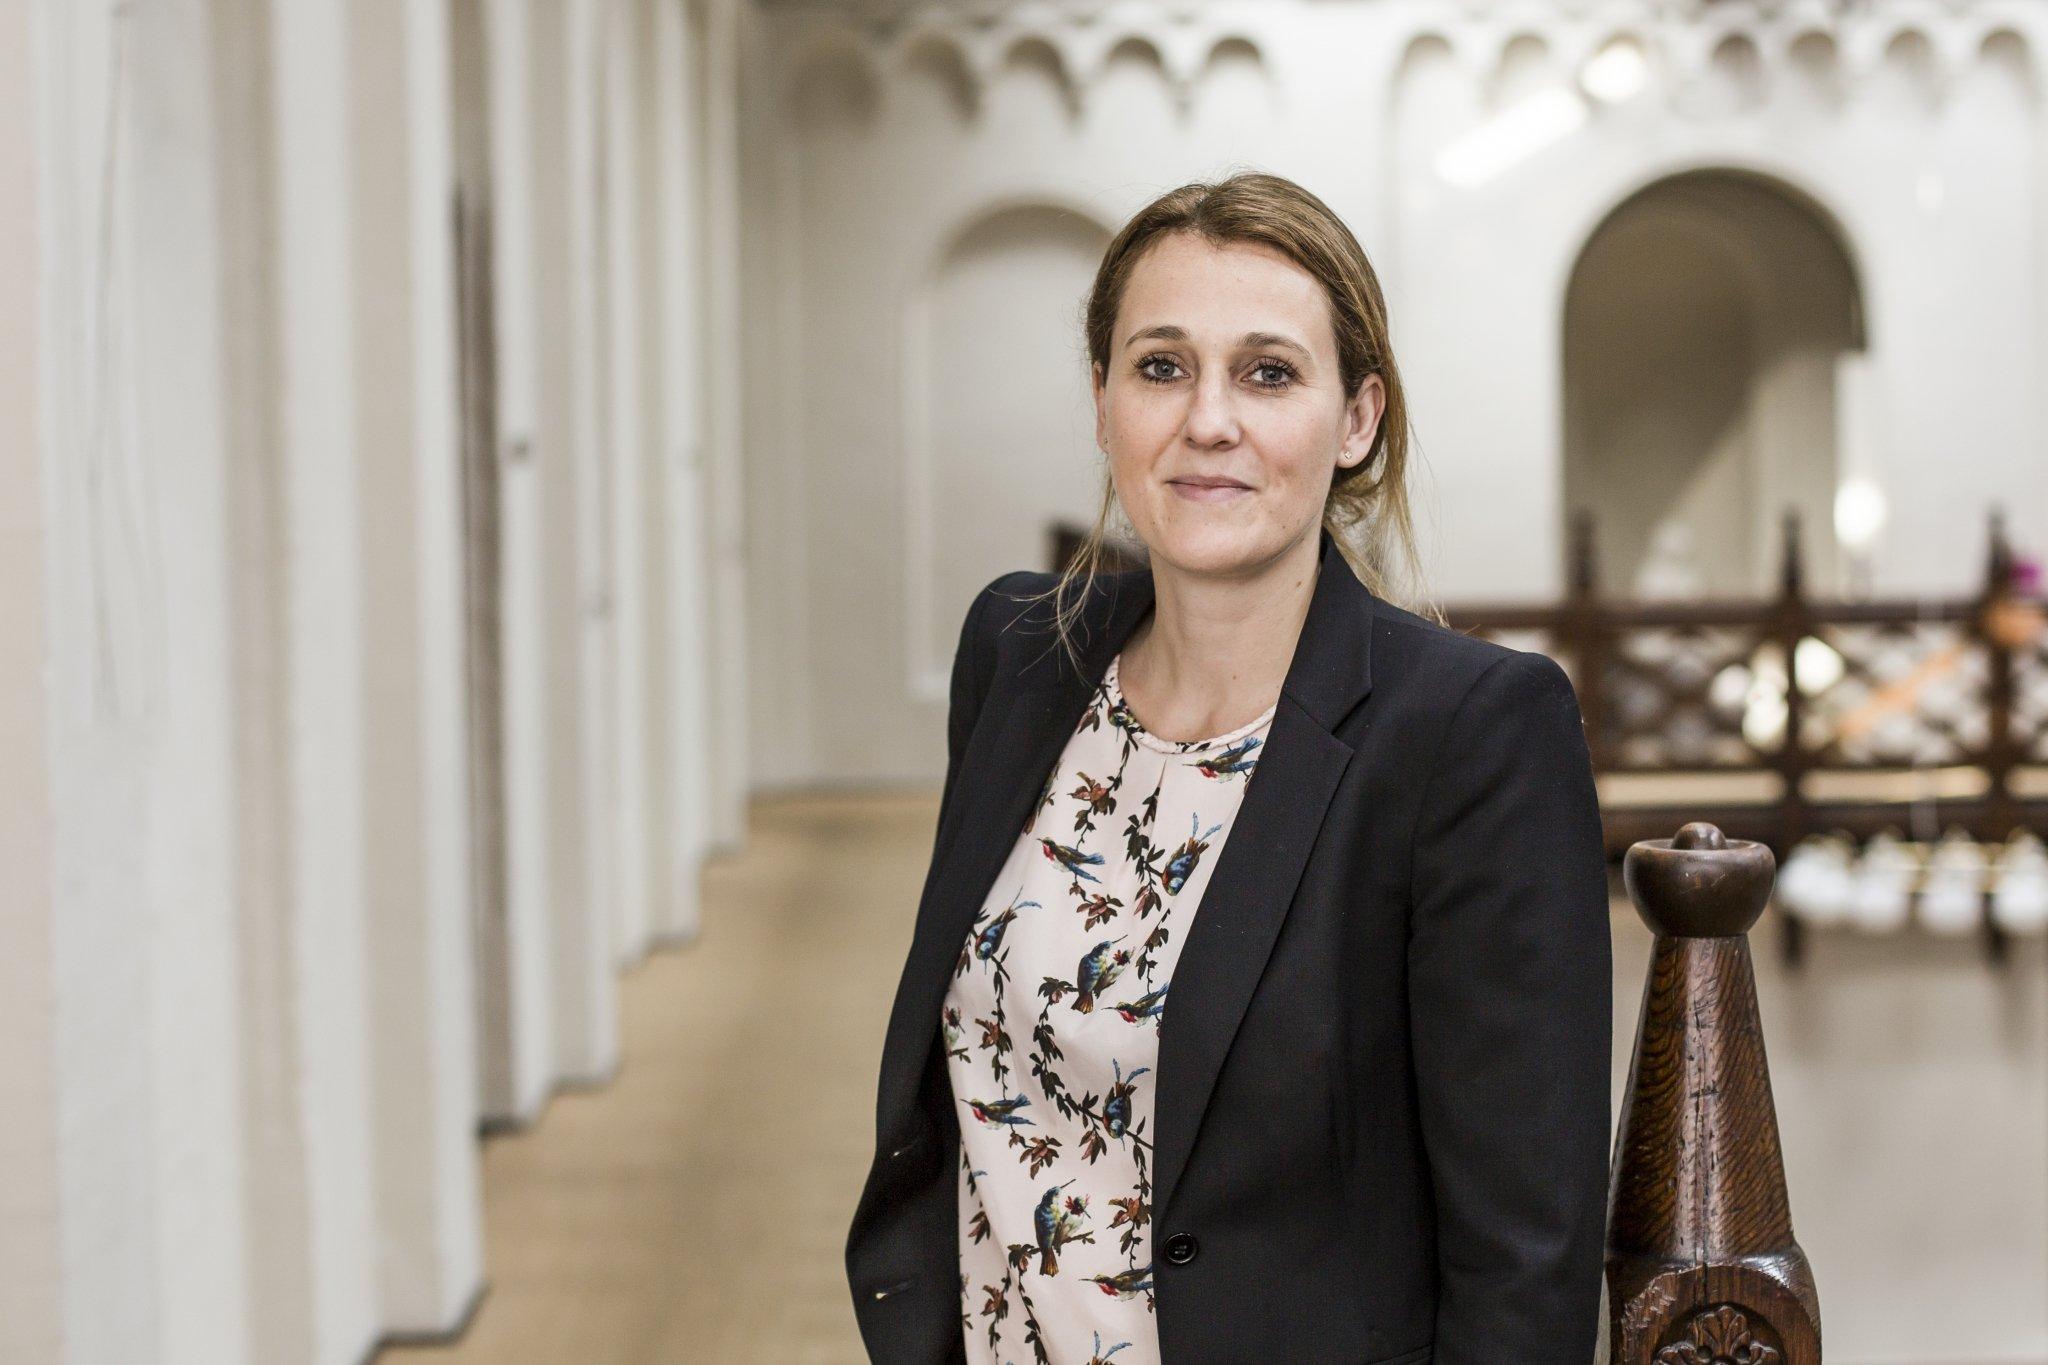 Christine Meden Bjerregaard